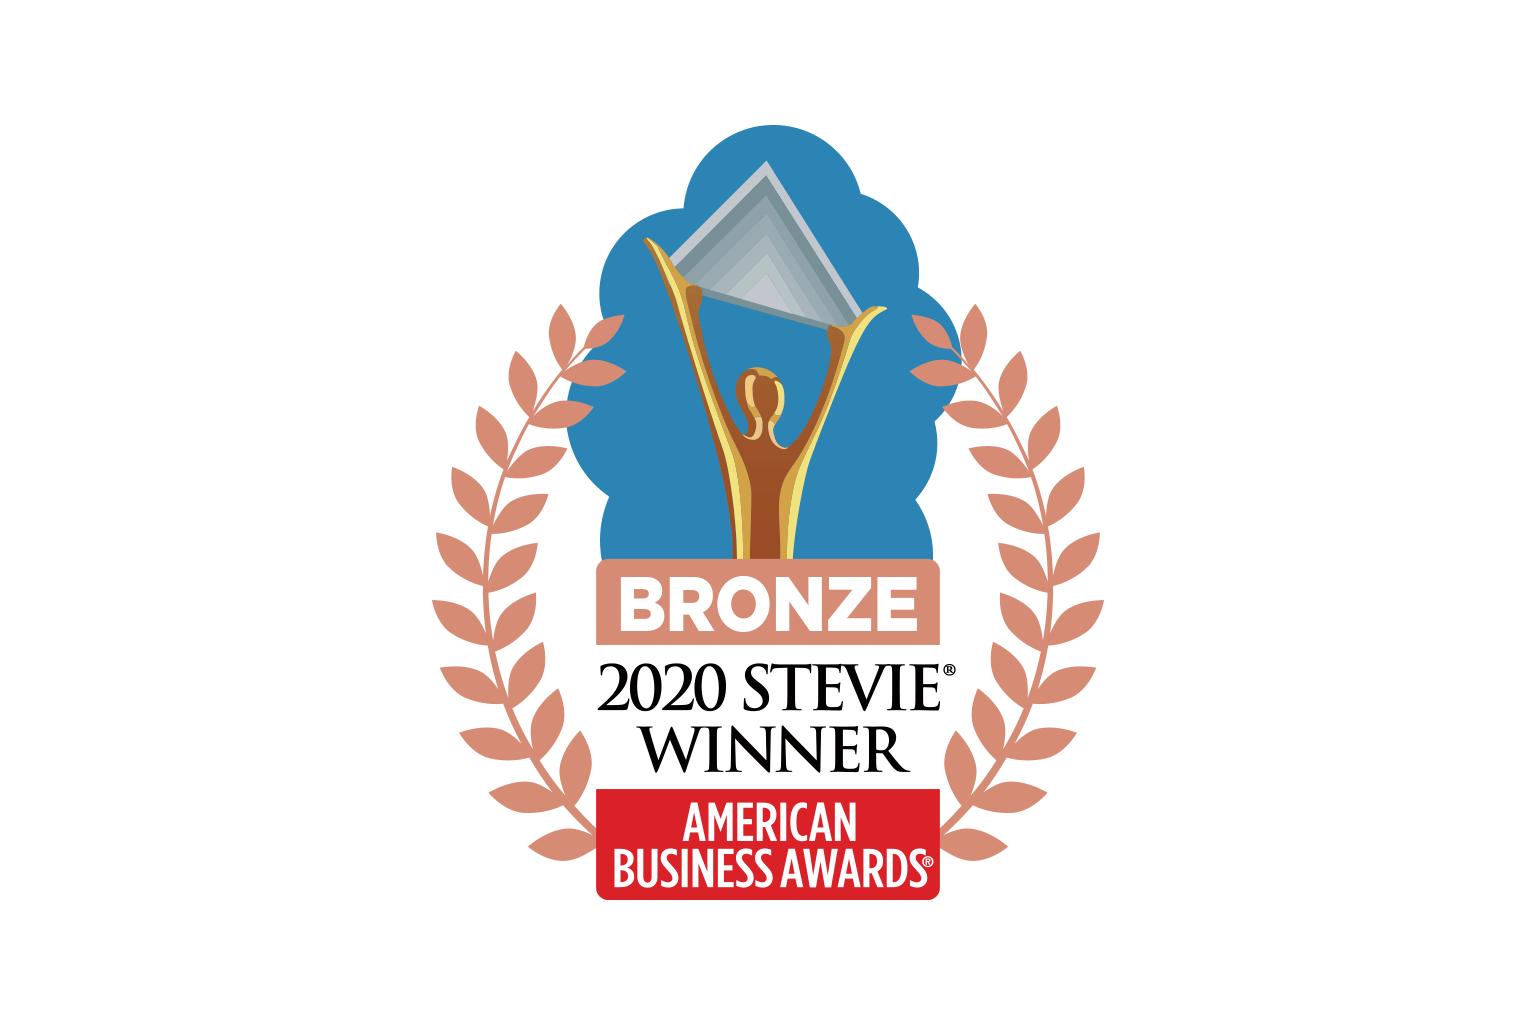 2020 ABA Stevie Bronze